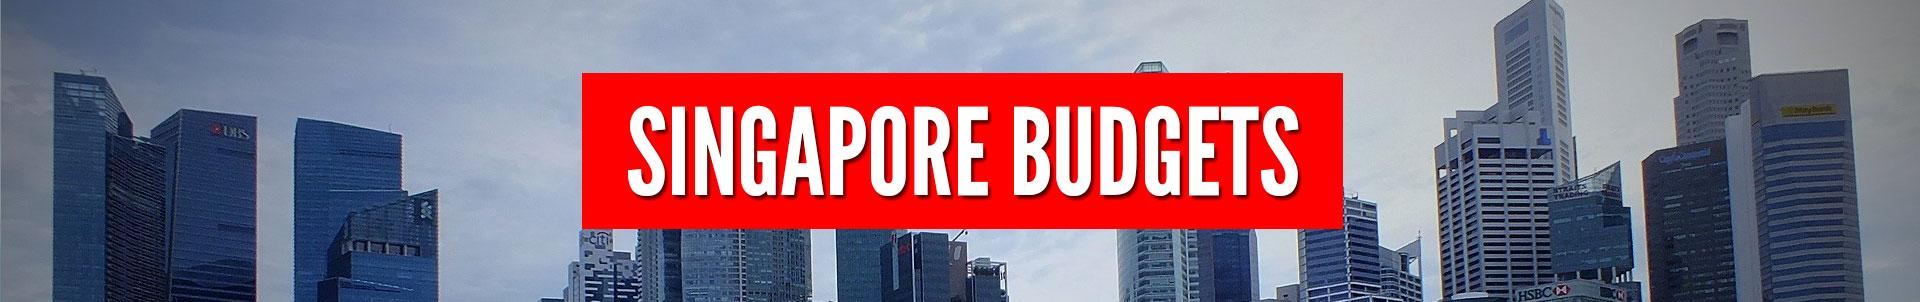 Singapore Budget Page